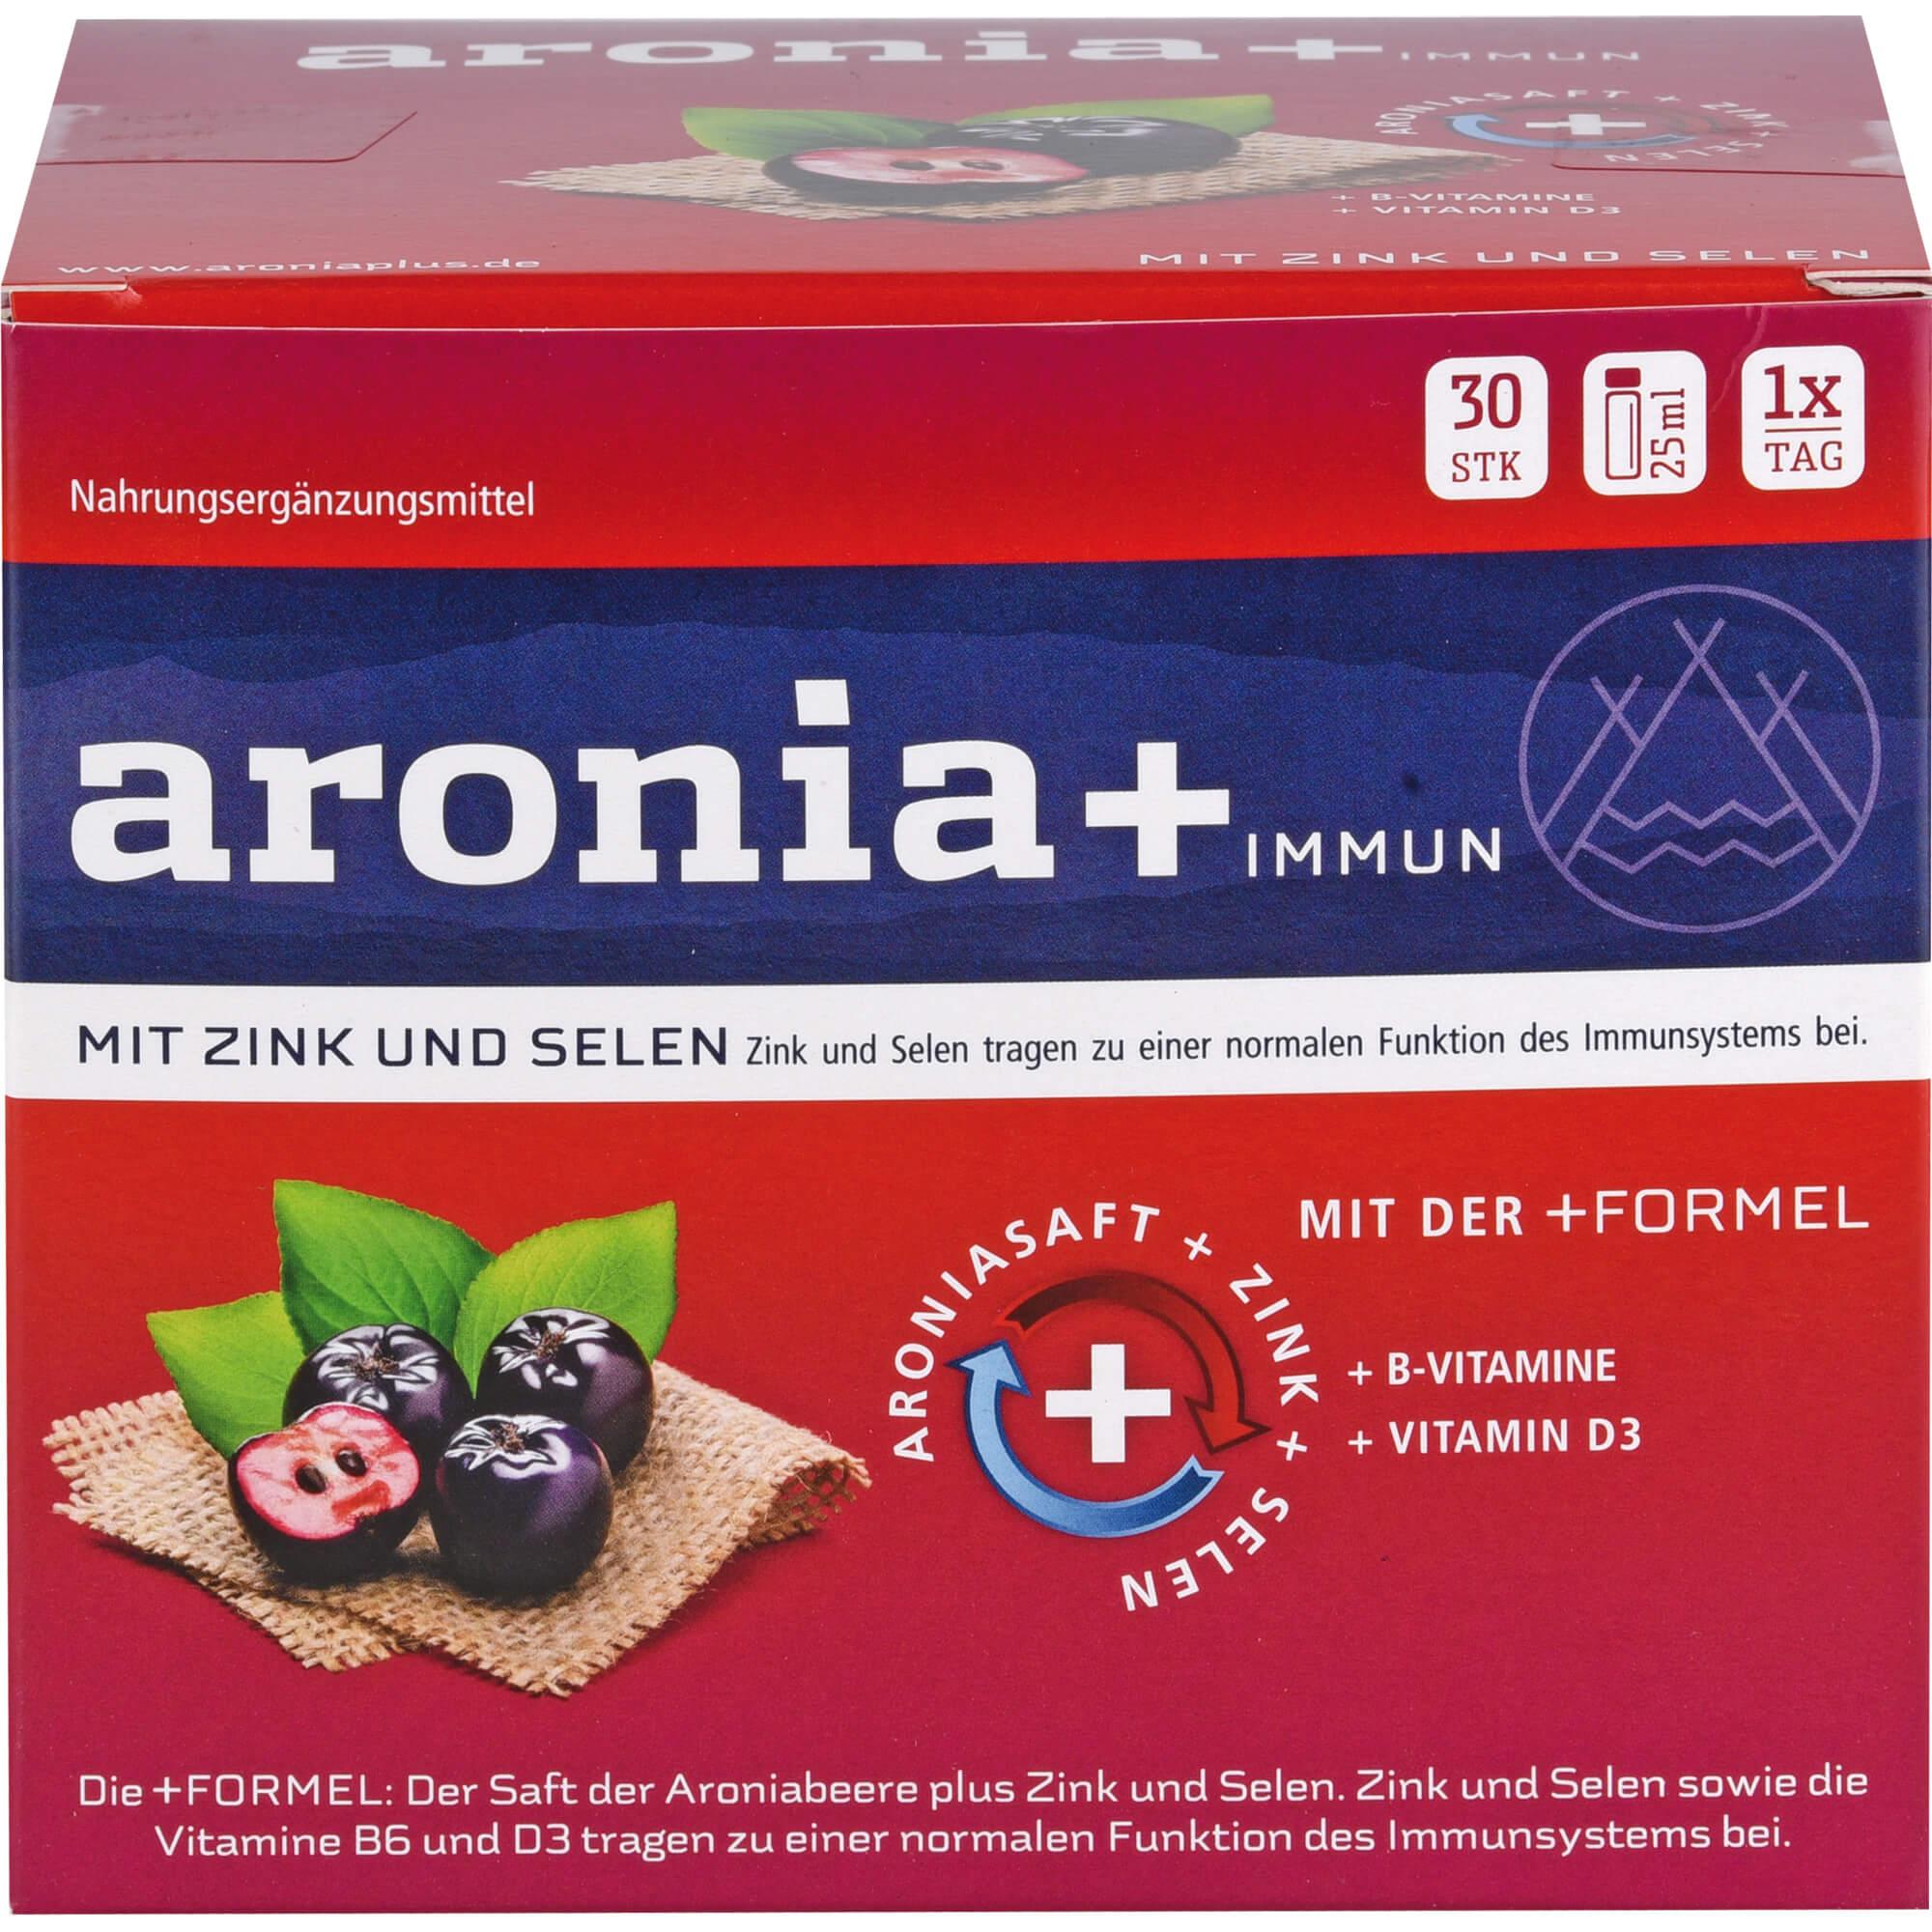 ARONIA-IMMUN-Monatspackung-Trinkampullen